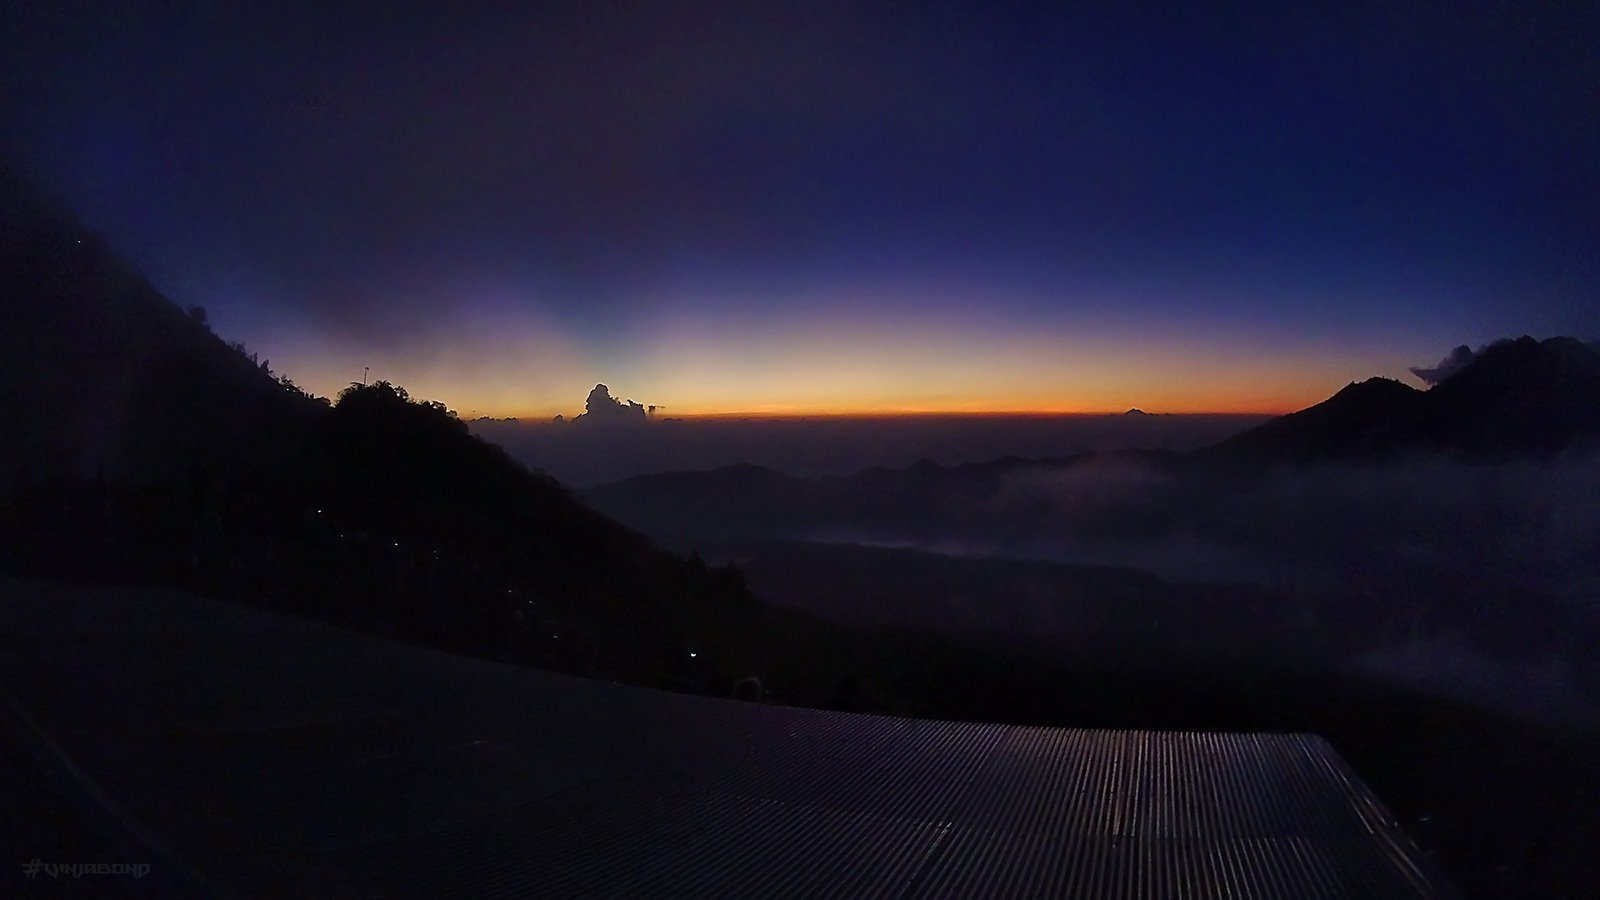 Peak of Mount Bature, Seconds Before Sunrise /// Vinjabond